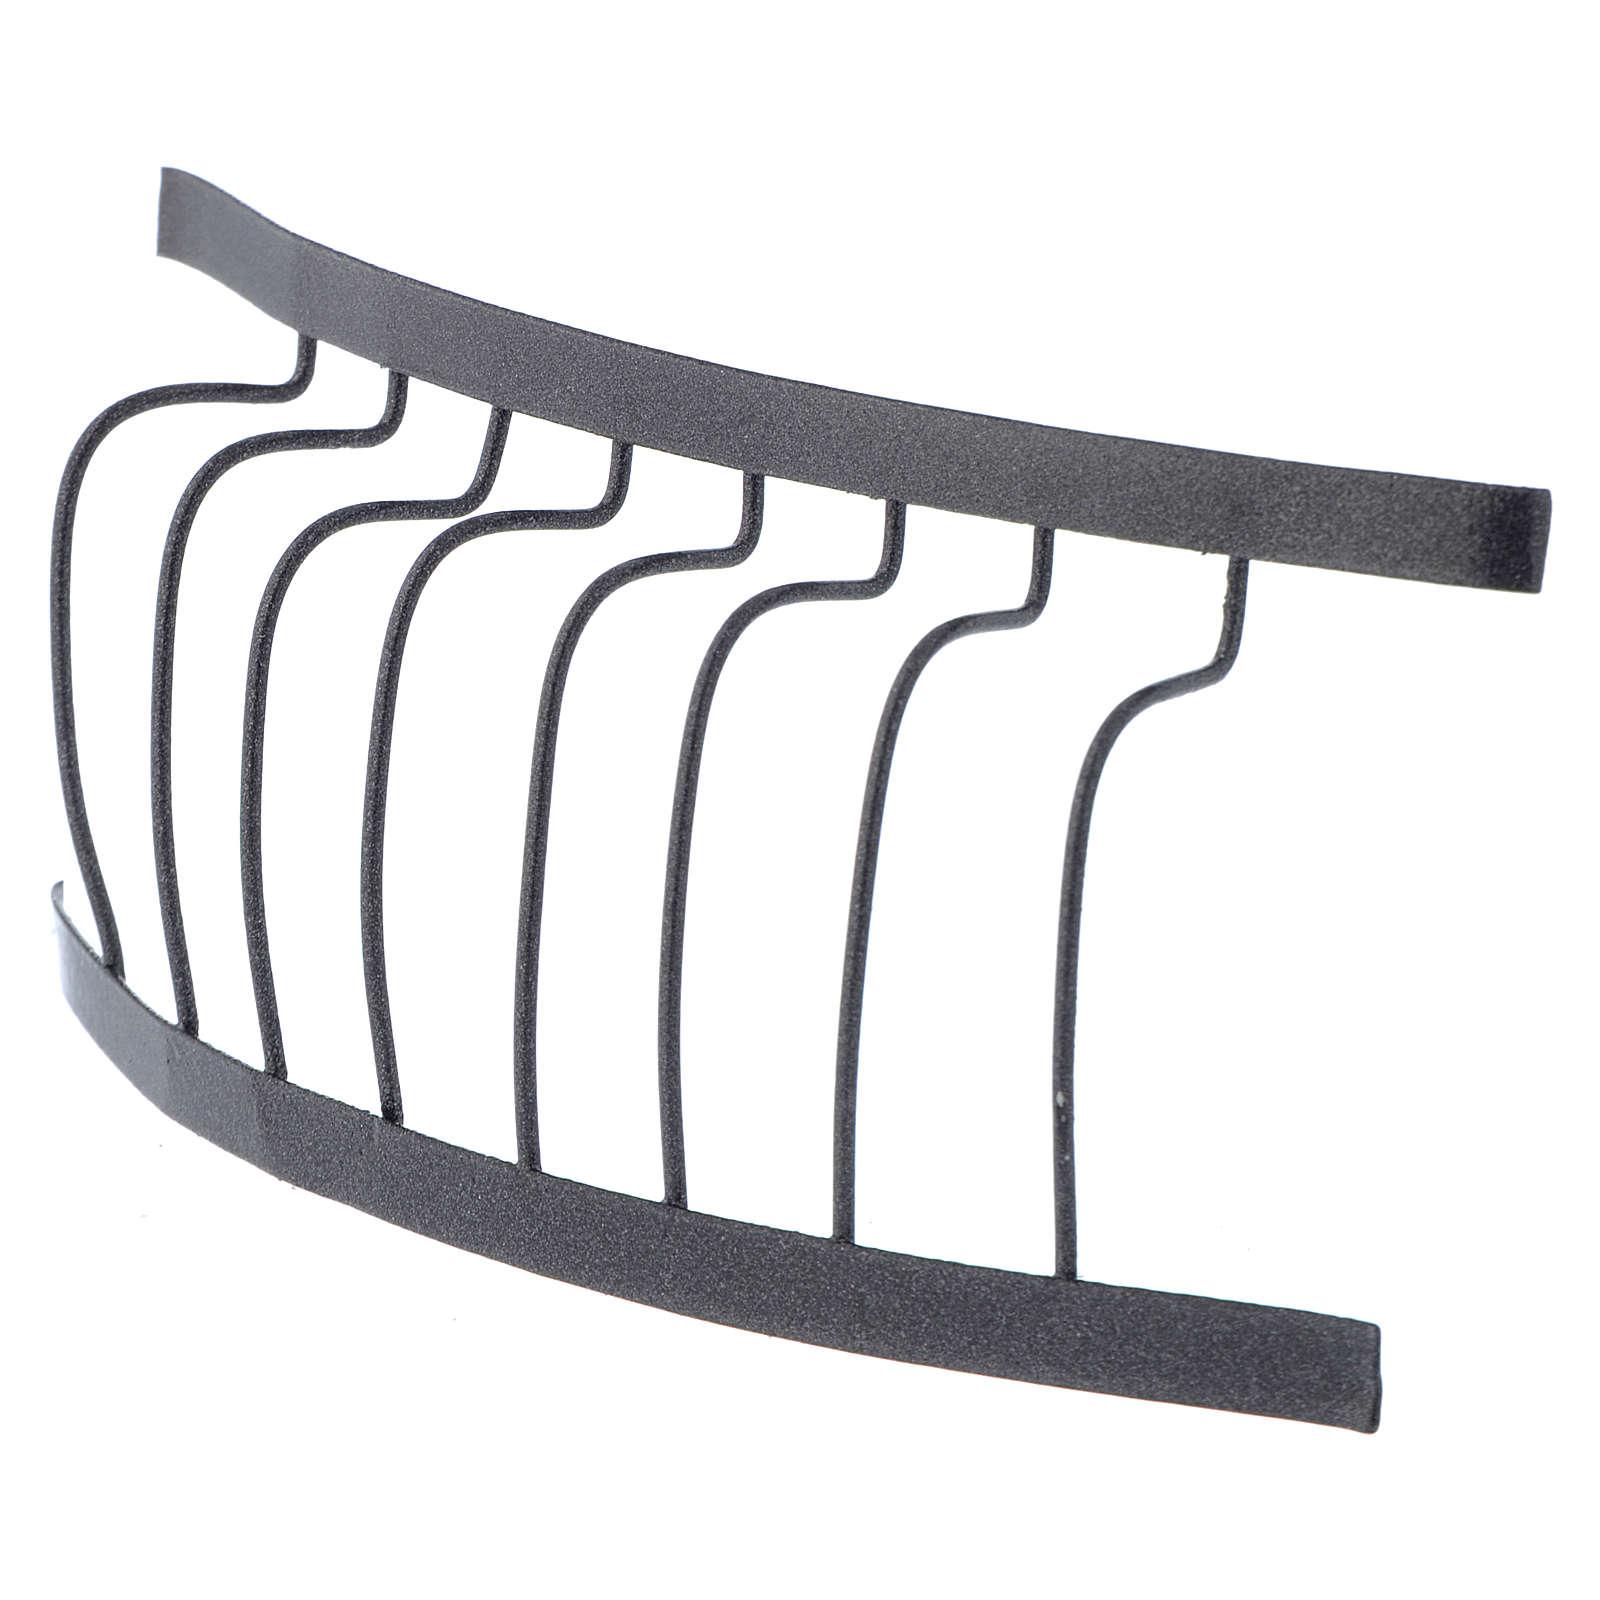 Ringhiera in ferro balcone 10x5 cm presepe fai da te 4